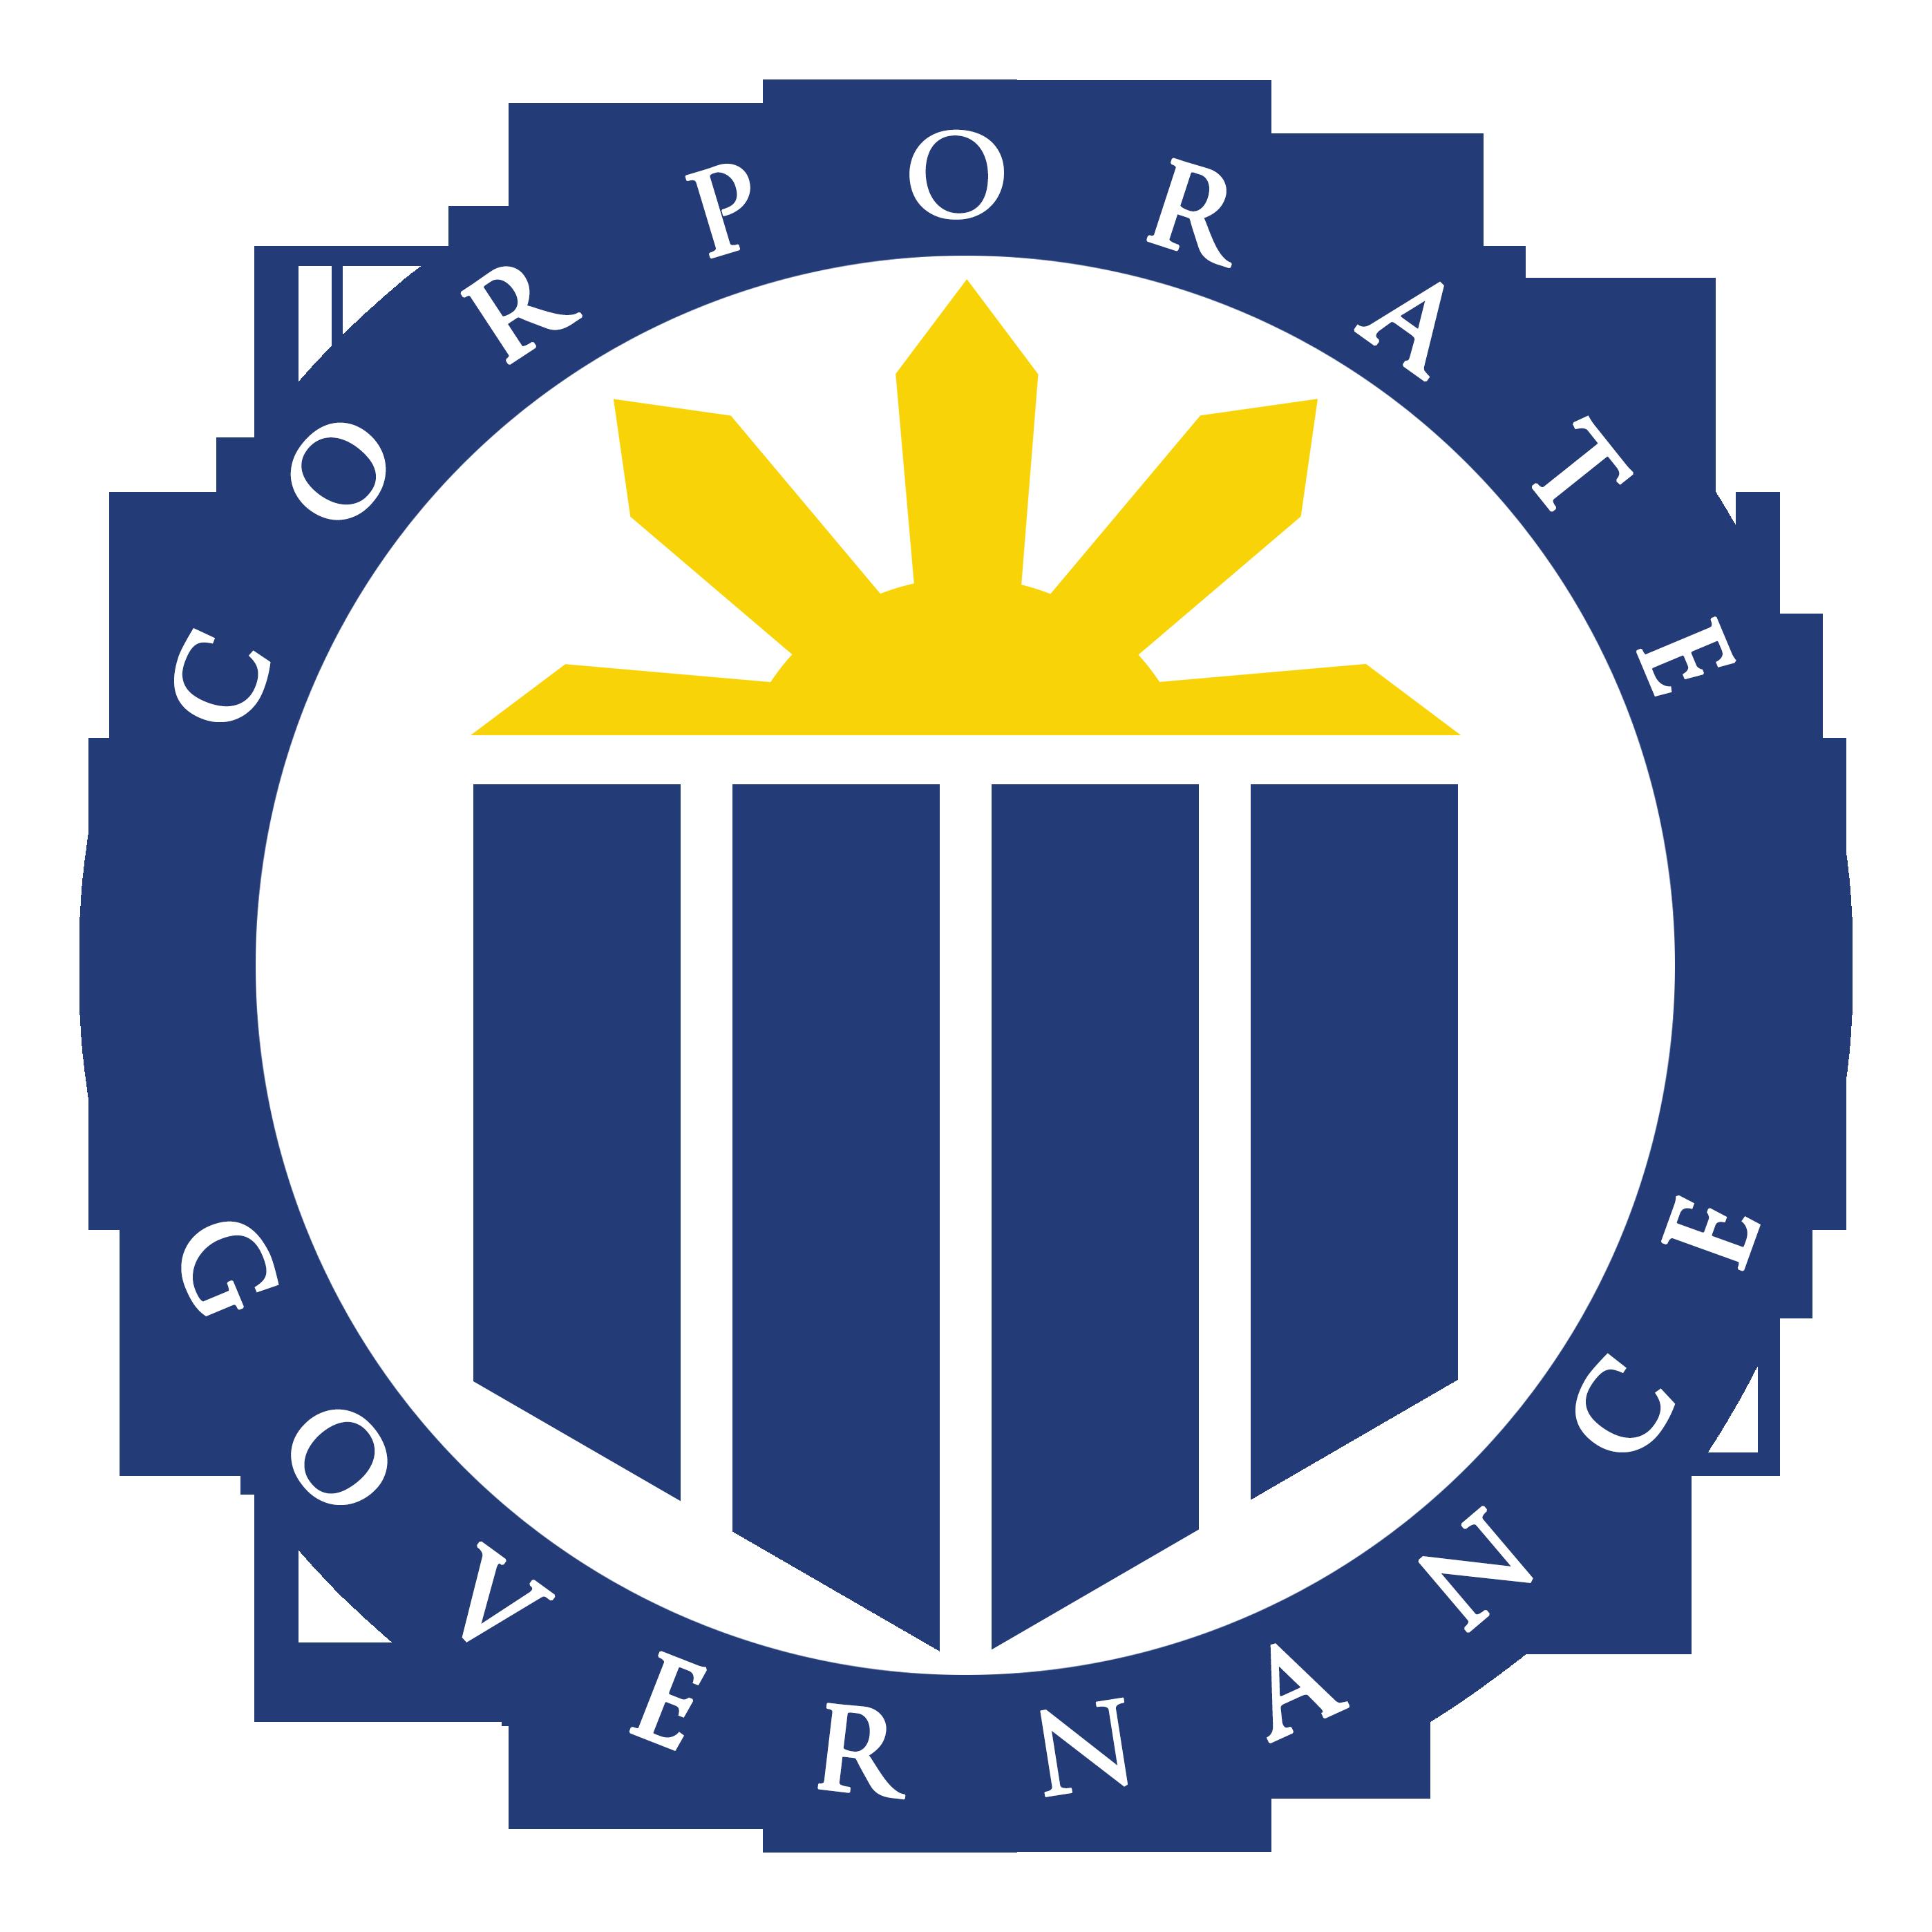 corporate governance - Patre Boules Colores